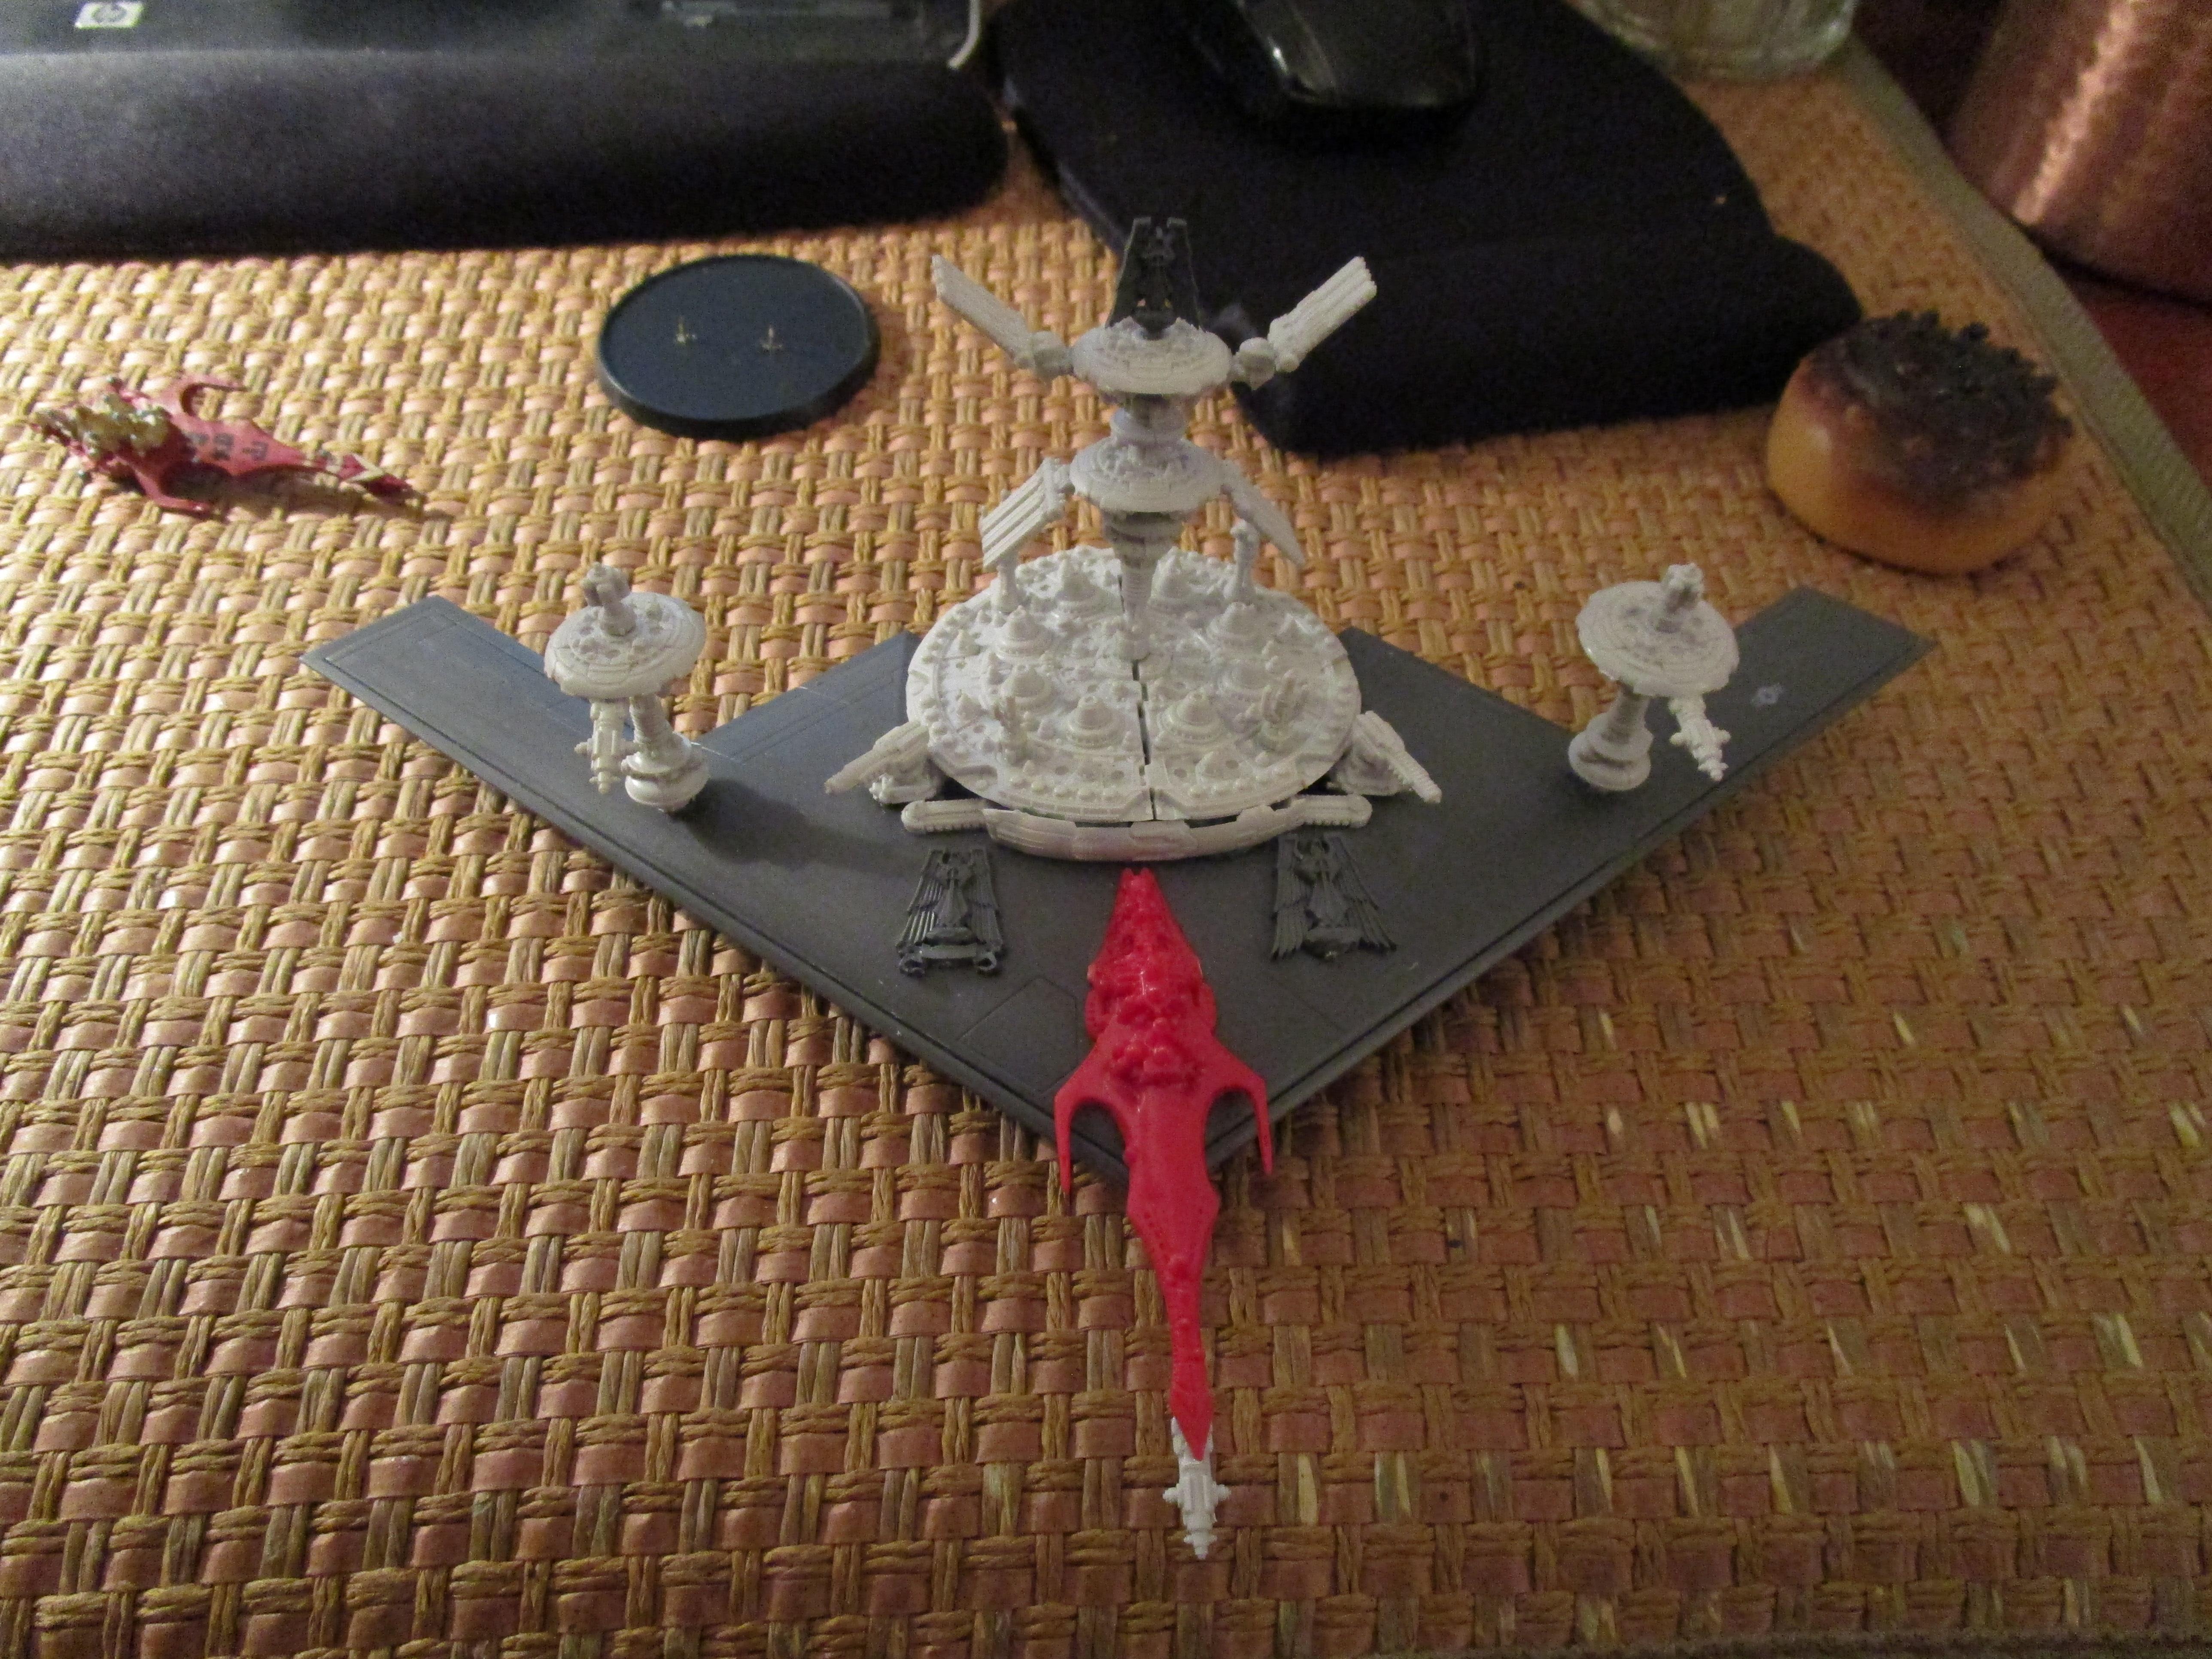 Battlefleet Gothic, Battleship, Space Fleet